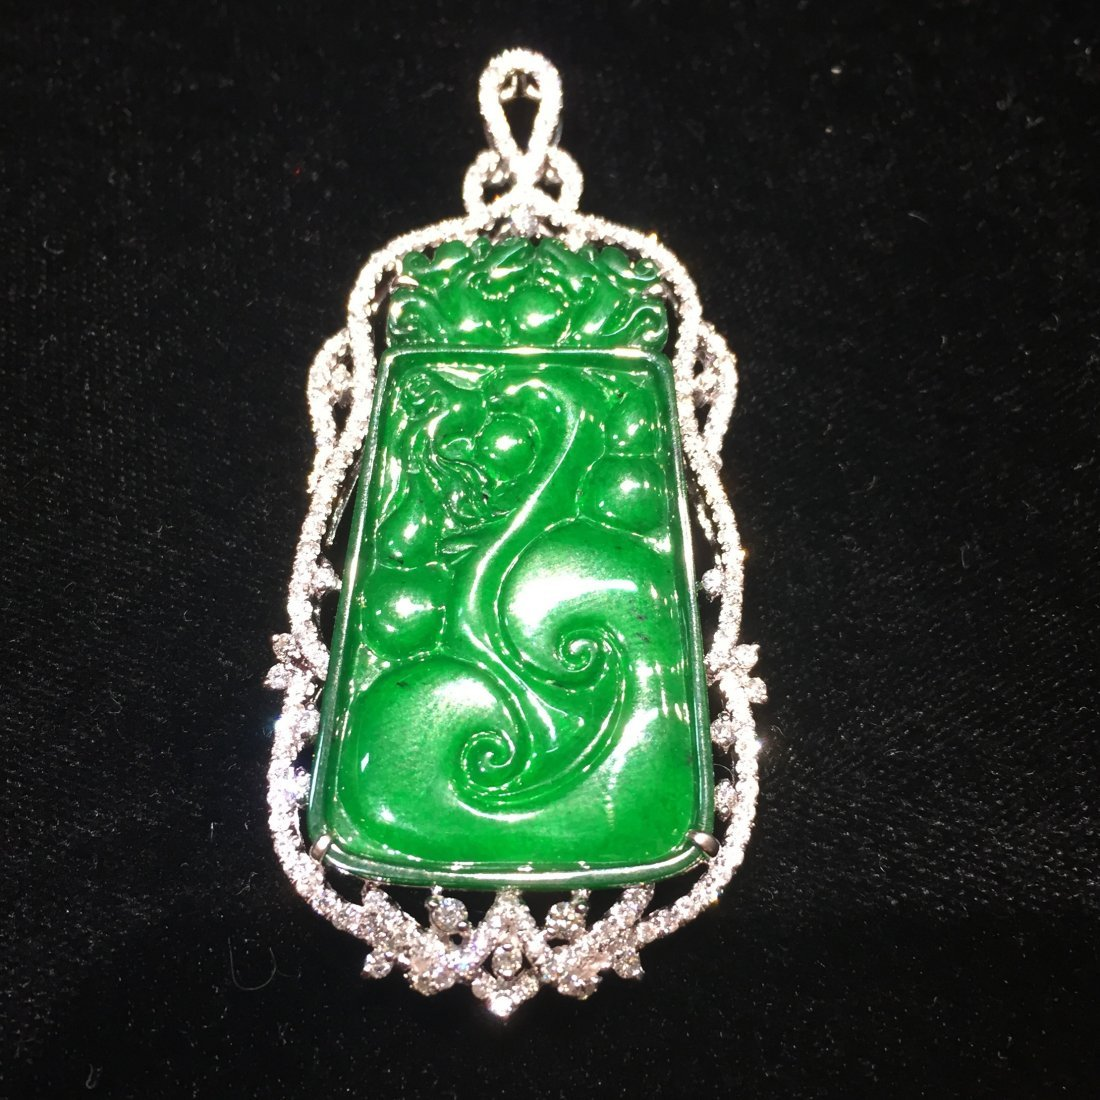 Certified Natural Burma Glassy Imperial Jadeite 18k